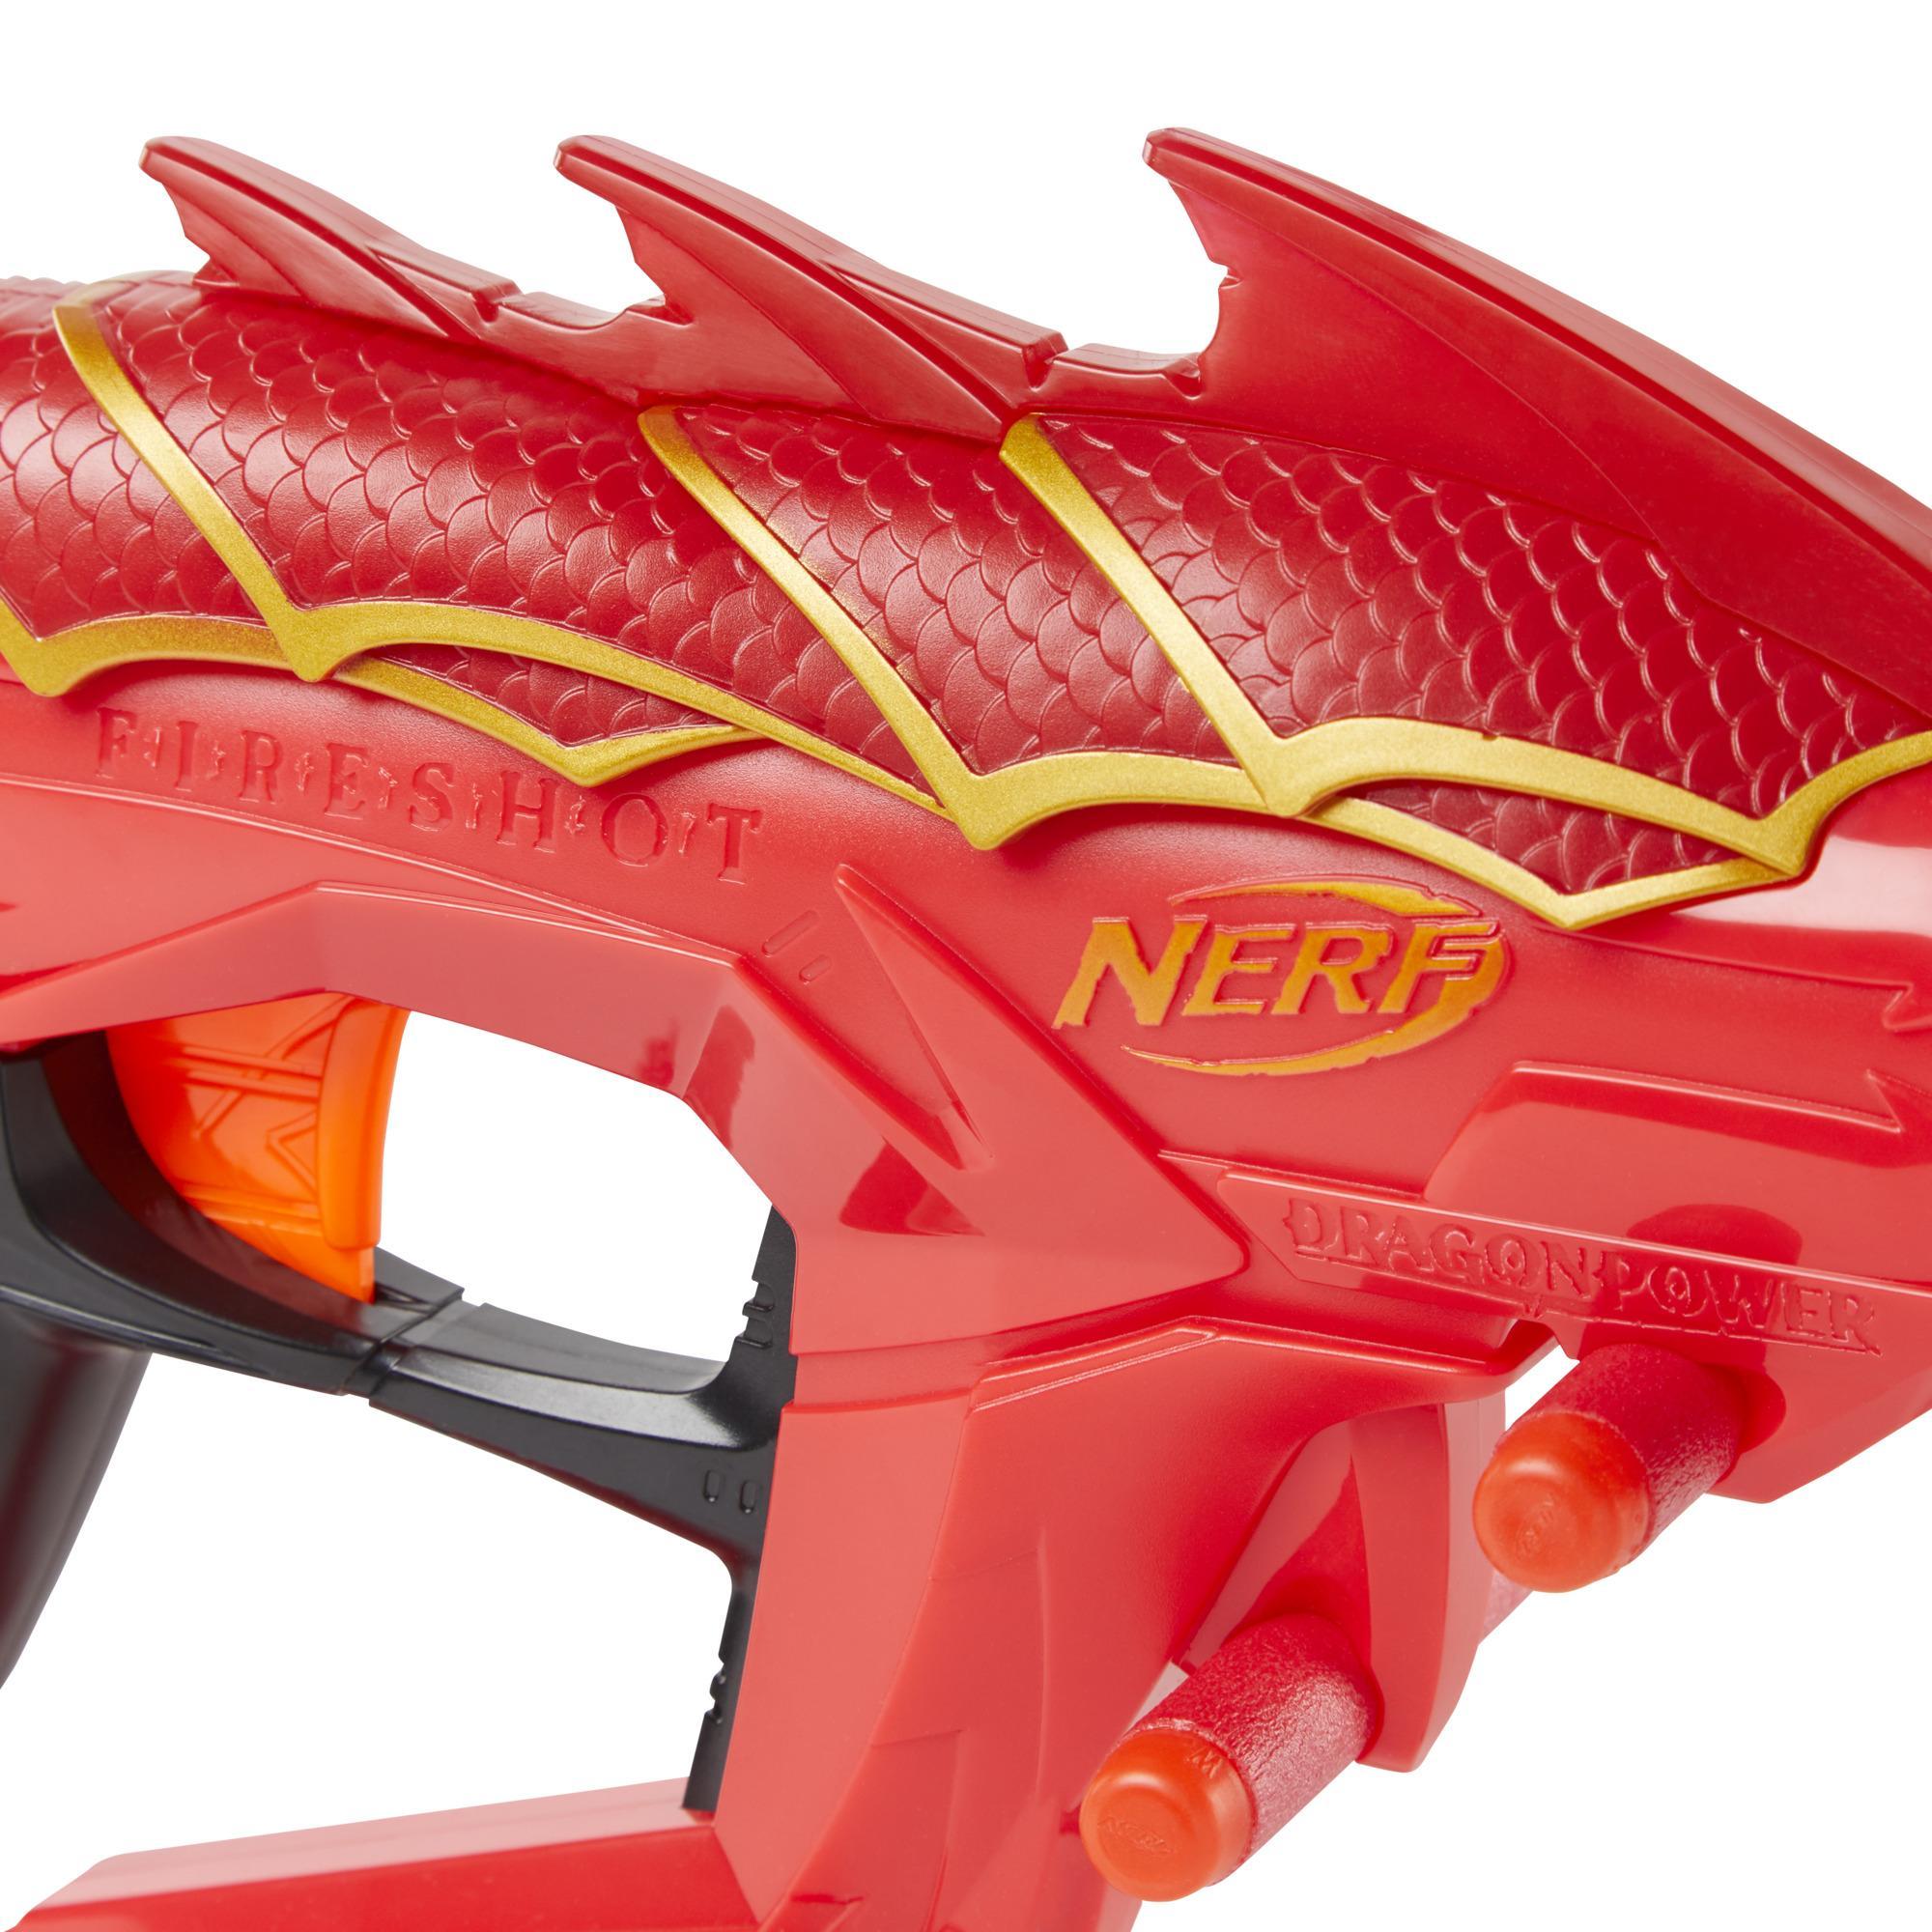 Nerf DragonPower Fireshot